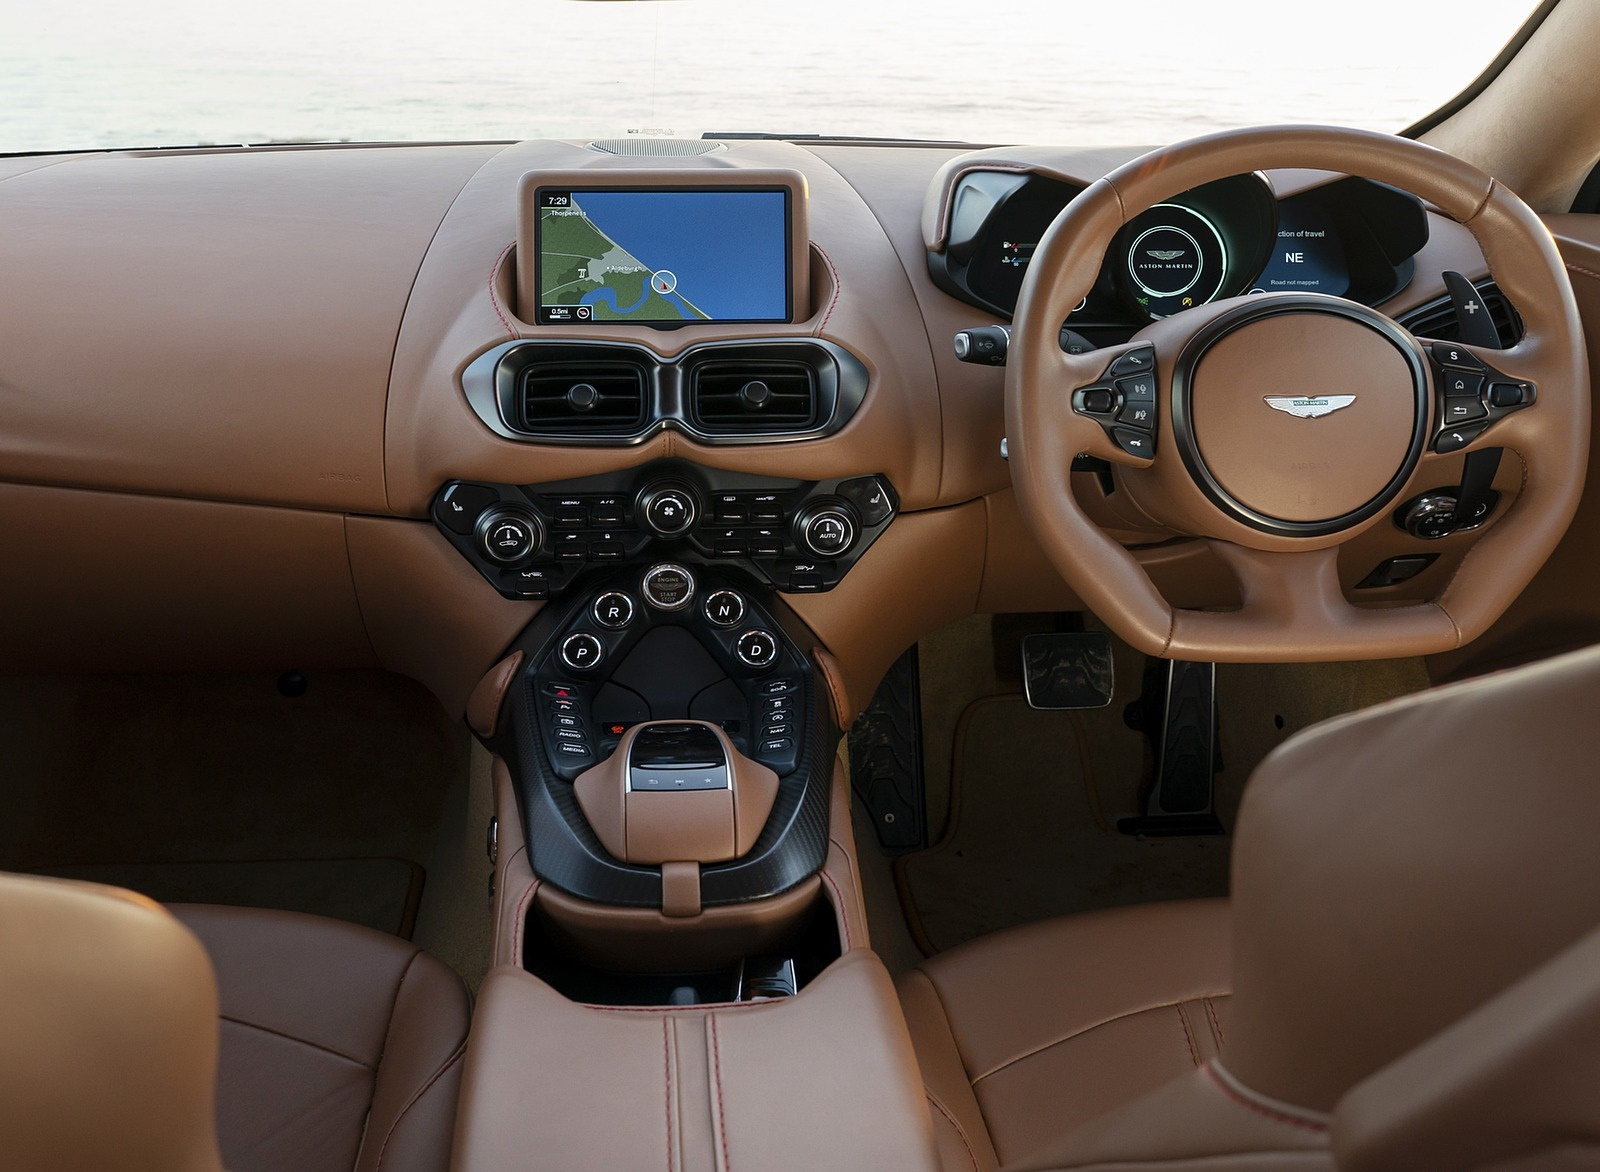 2019 Aston Martin Vantage Uk Spec Interior Cockpit Wallpapers 74 Newcarcars